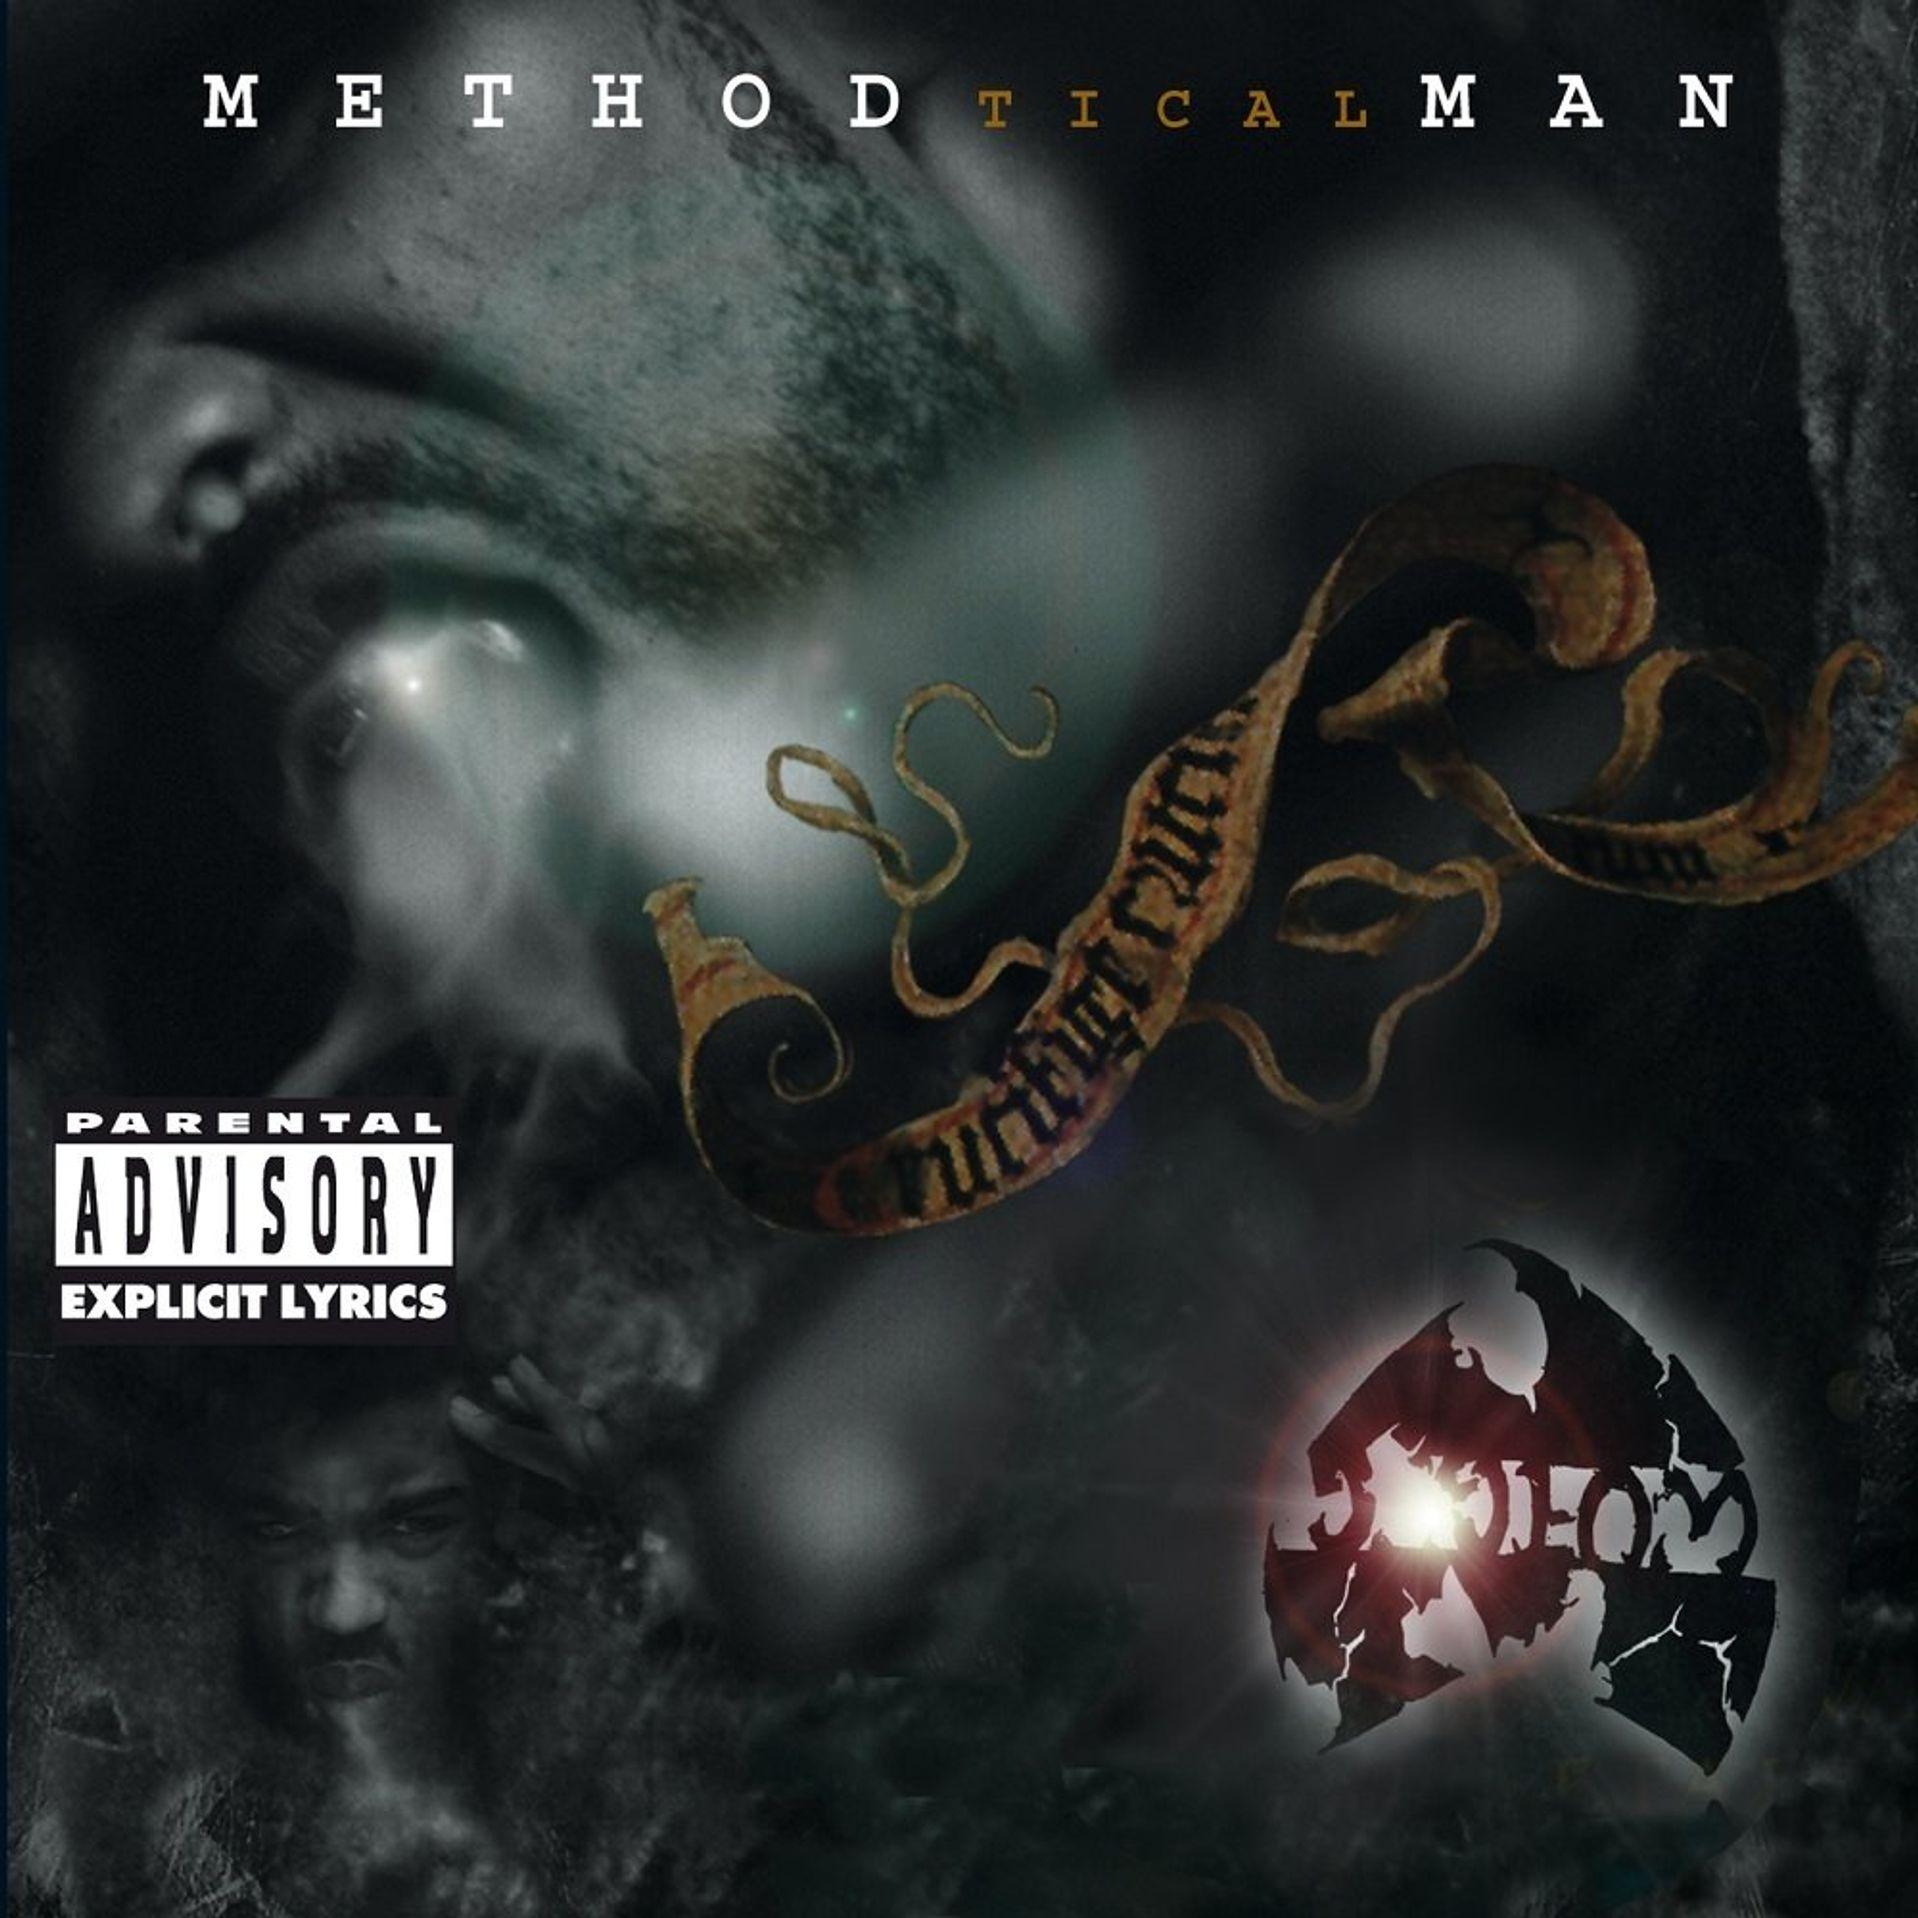 Album Title: Tical by: Method Man